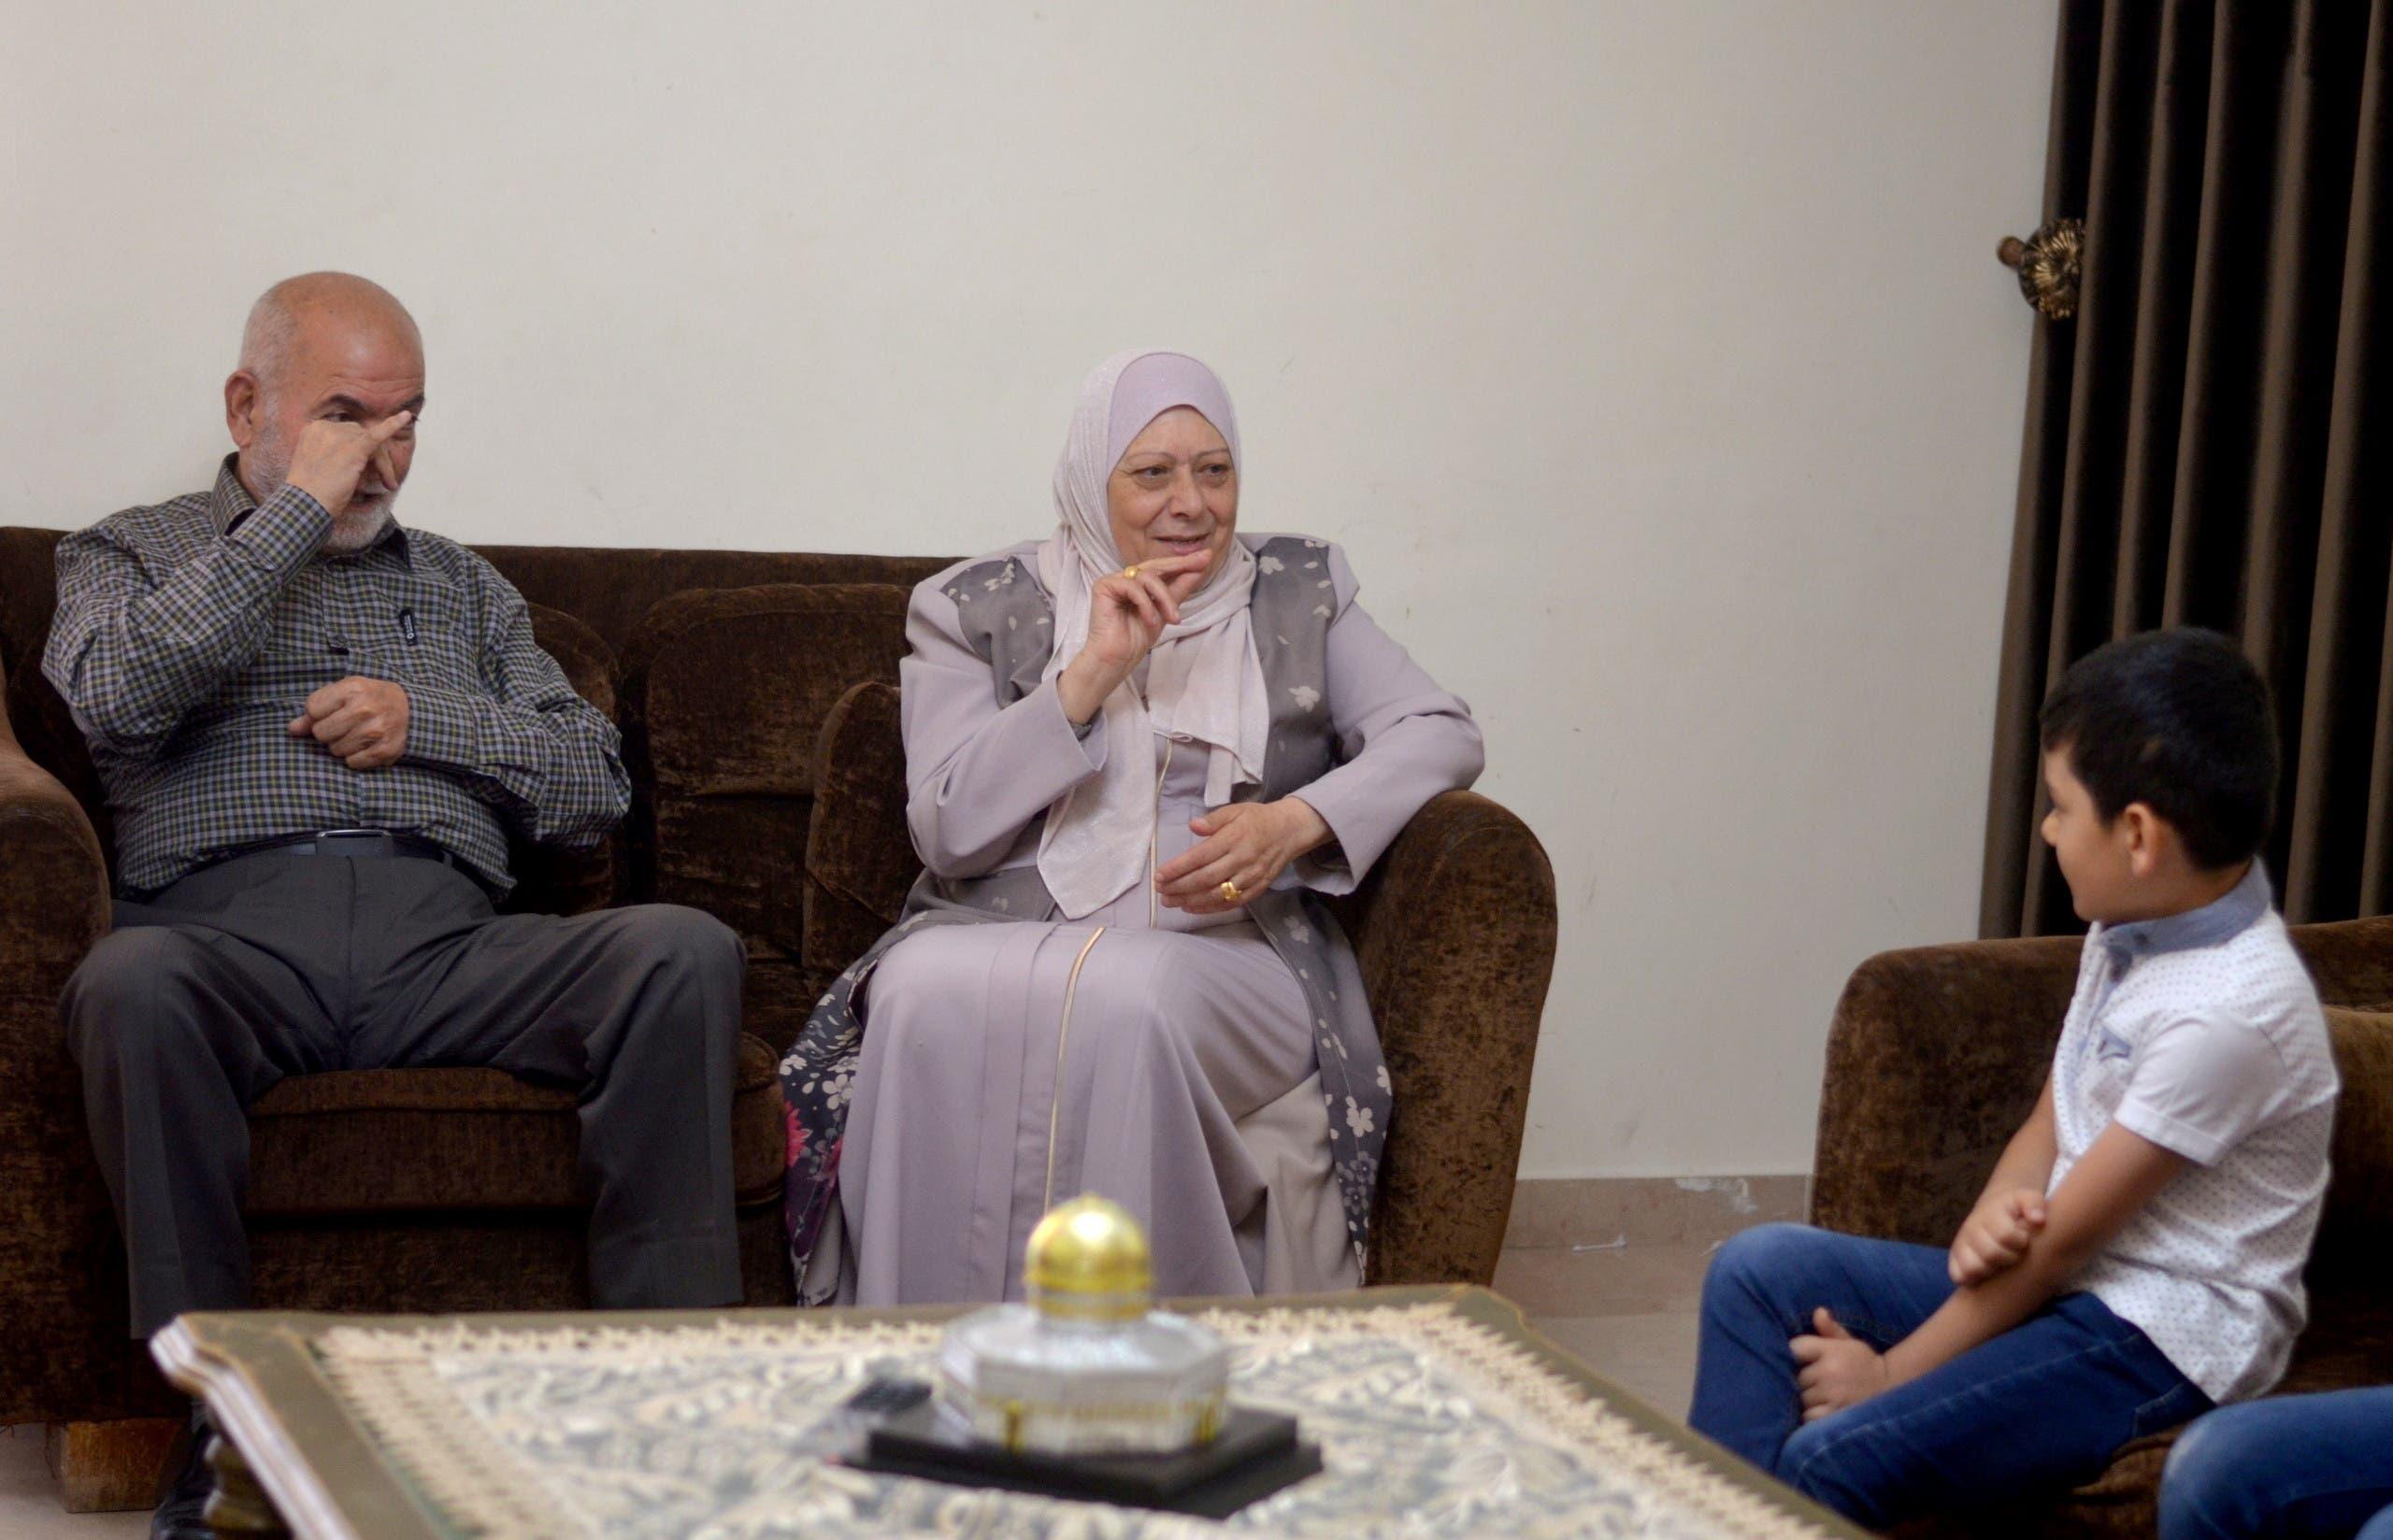 Grandparents of Aws Oudah, 5, talk to him through sign language at his home in Amman, Jordan June 2, 2021. Picture taken June 2, 2021. (Reuters)